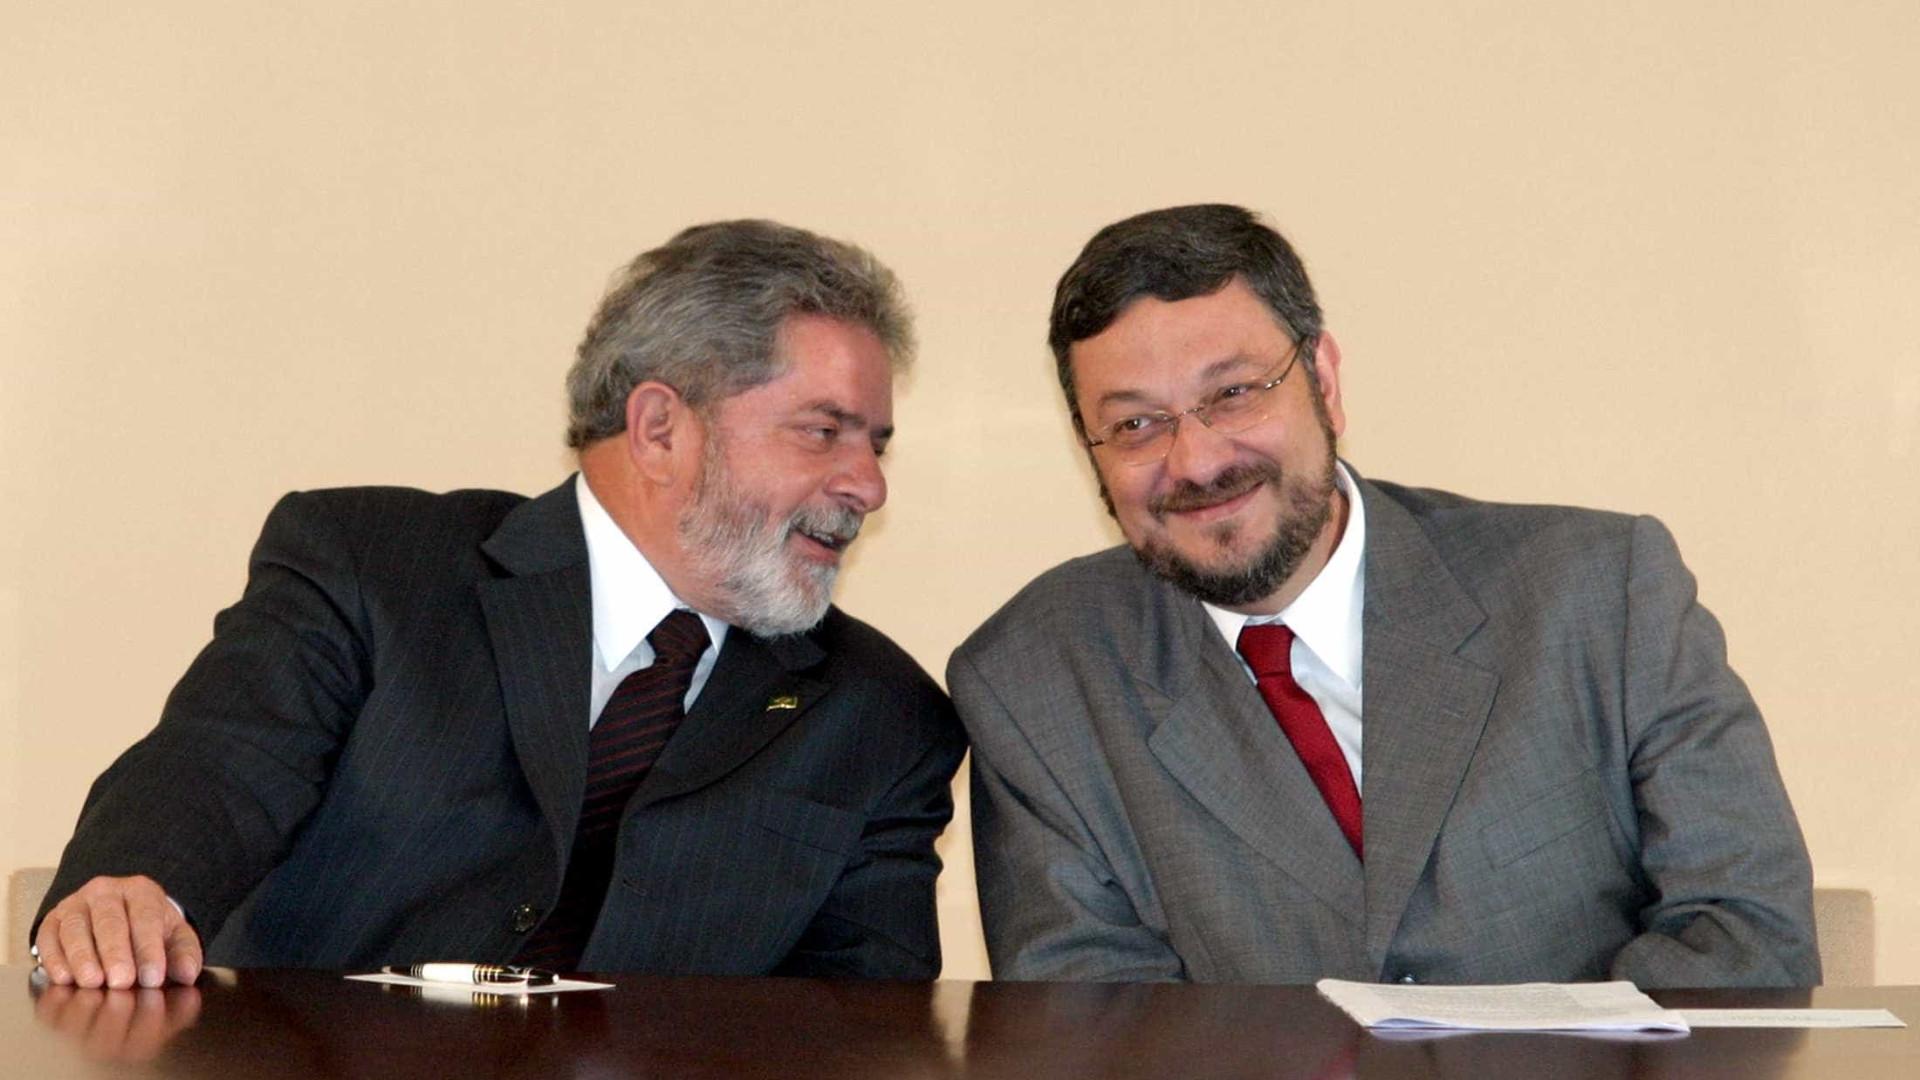 Odebrecht: MPF acusa Lula e Palocci de receberem US$ 40 milhões